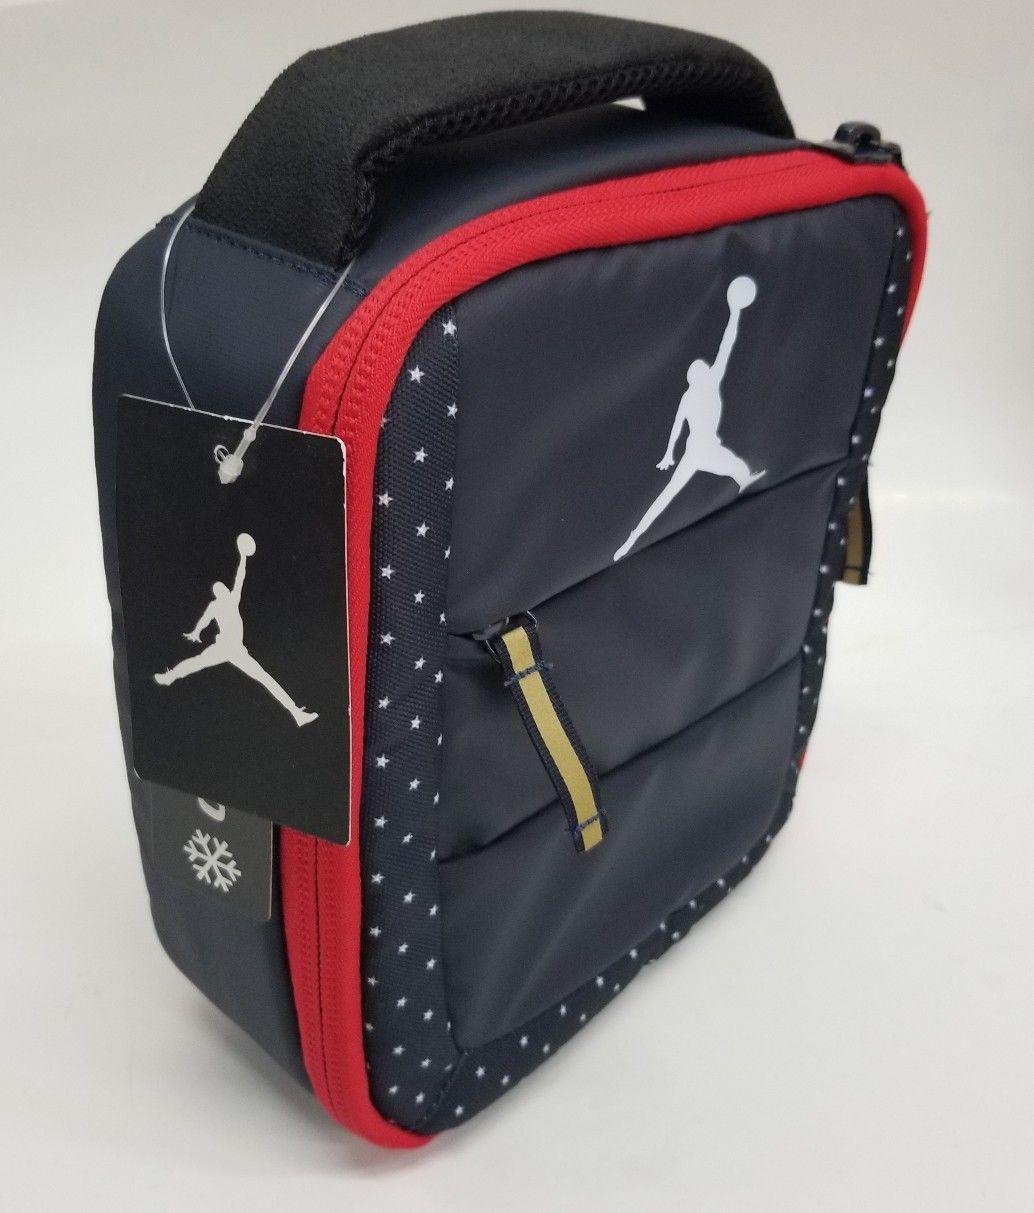 f11b7f54d3 Nike Air Jordan Insulated Lunch Box Bag Tote and similar items. S l1600